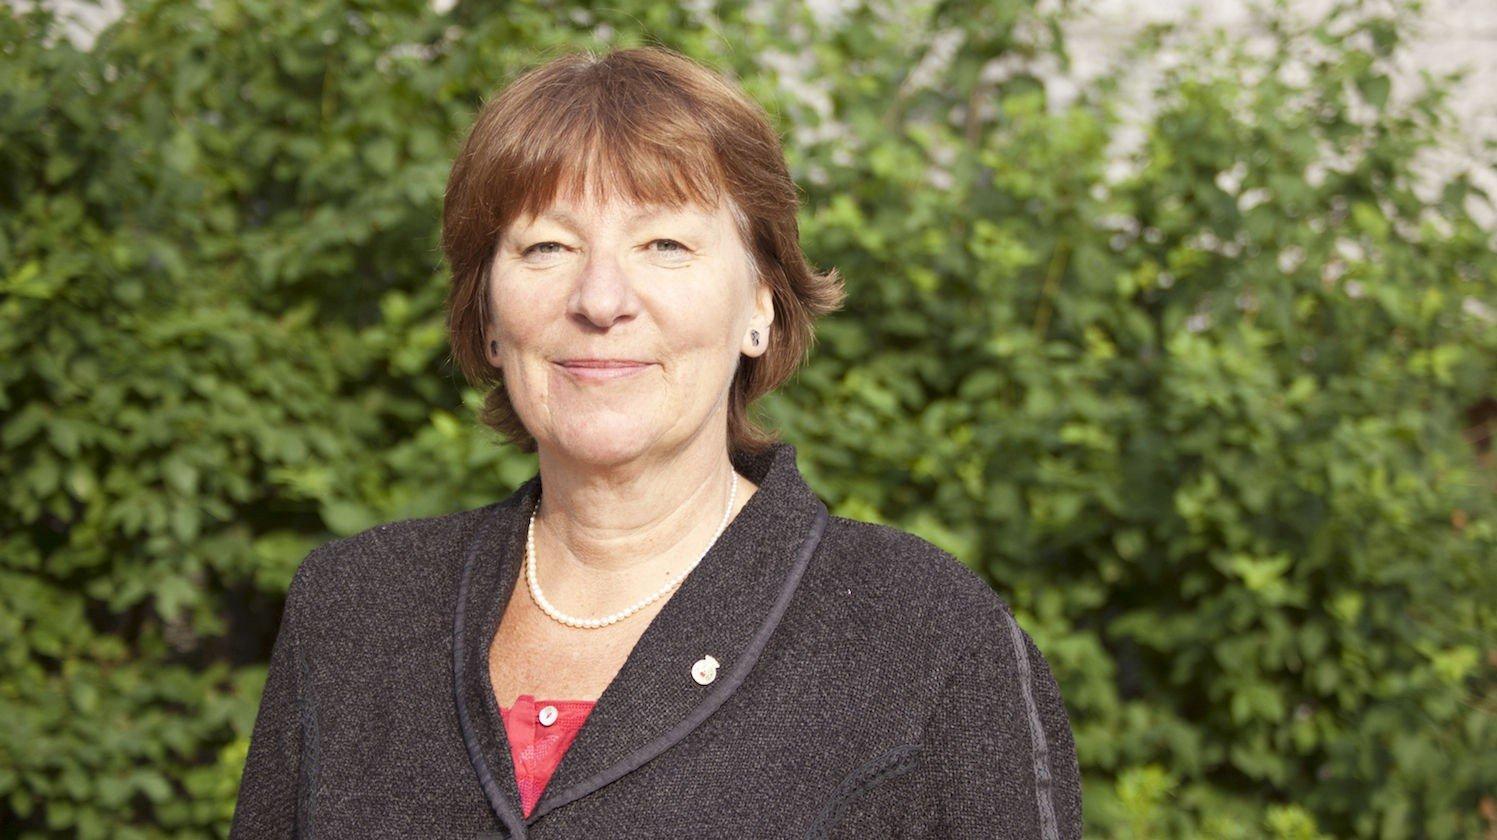 BER BYRÅDEN TA GREP: SVs gruppeleder i Oslo, Marianne Borgen, mener at byråd for helse og sosiale tjenester i Oslo, Øystein Søreide, bør stoppe.